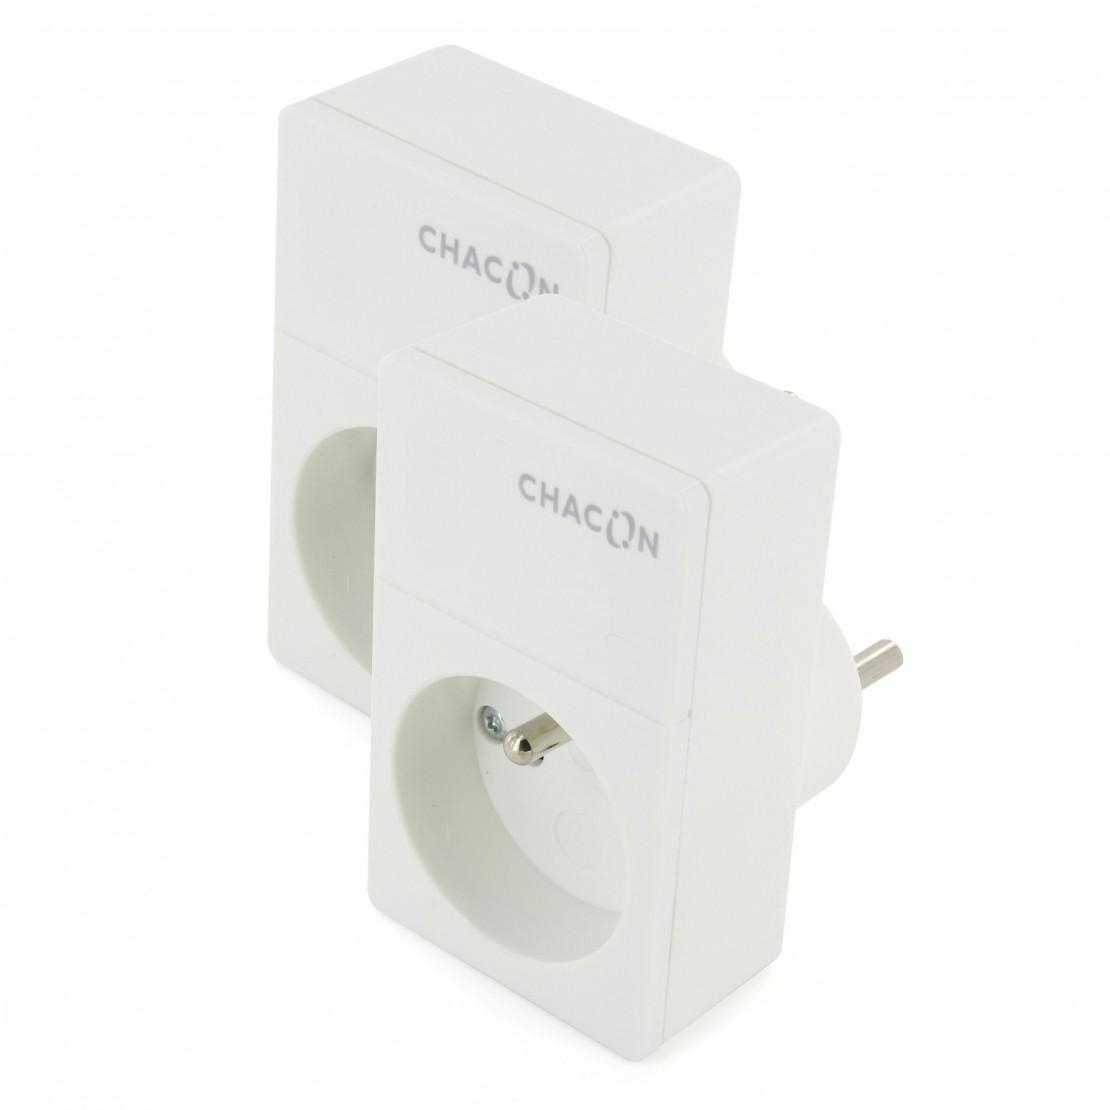 Duokit wifi-schakelstopcontacten CHACON - 2 wifi-schakelstopcontacten van Chacon